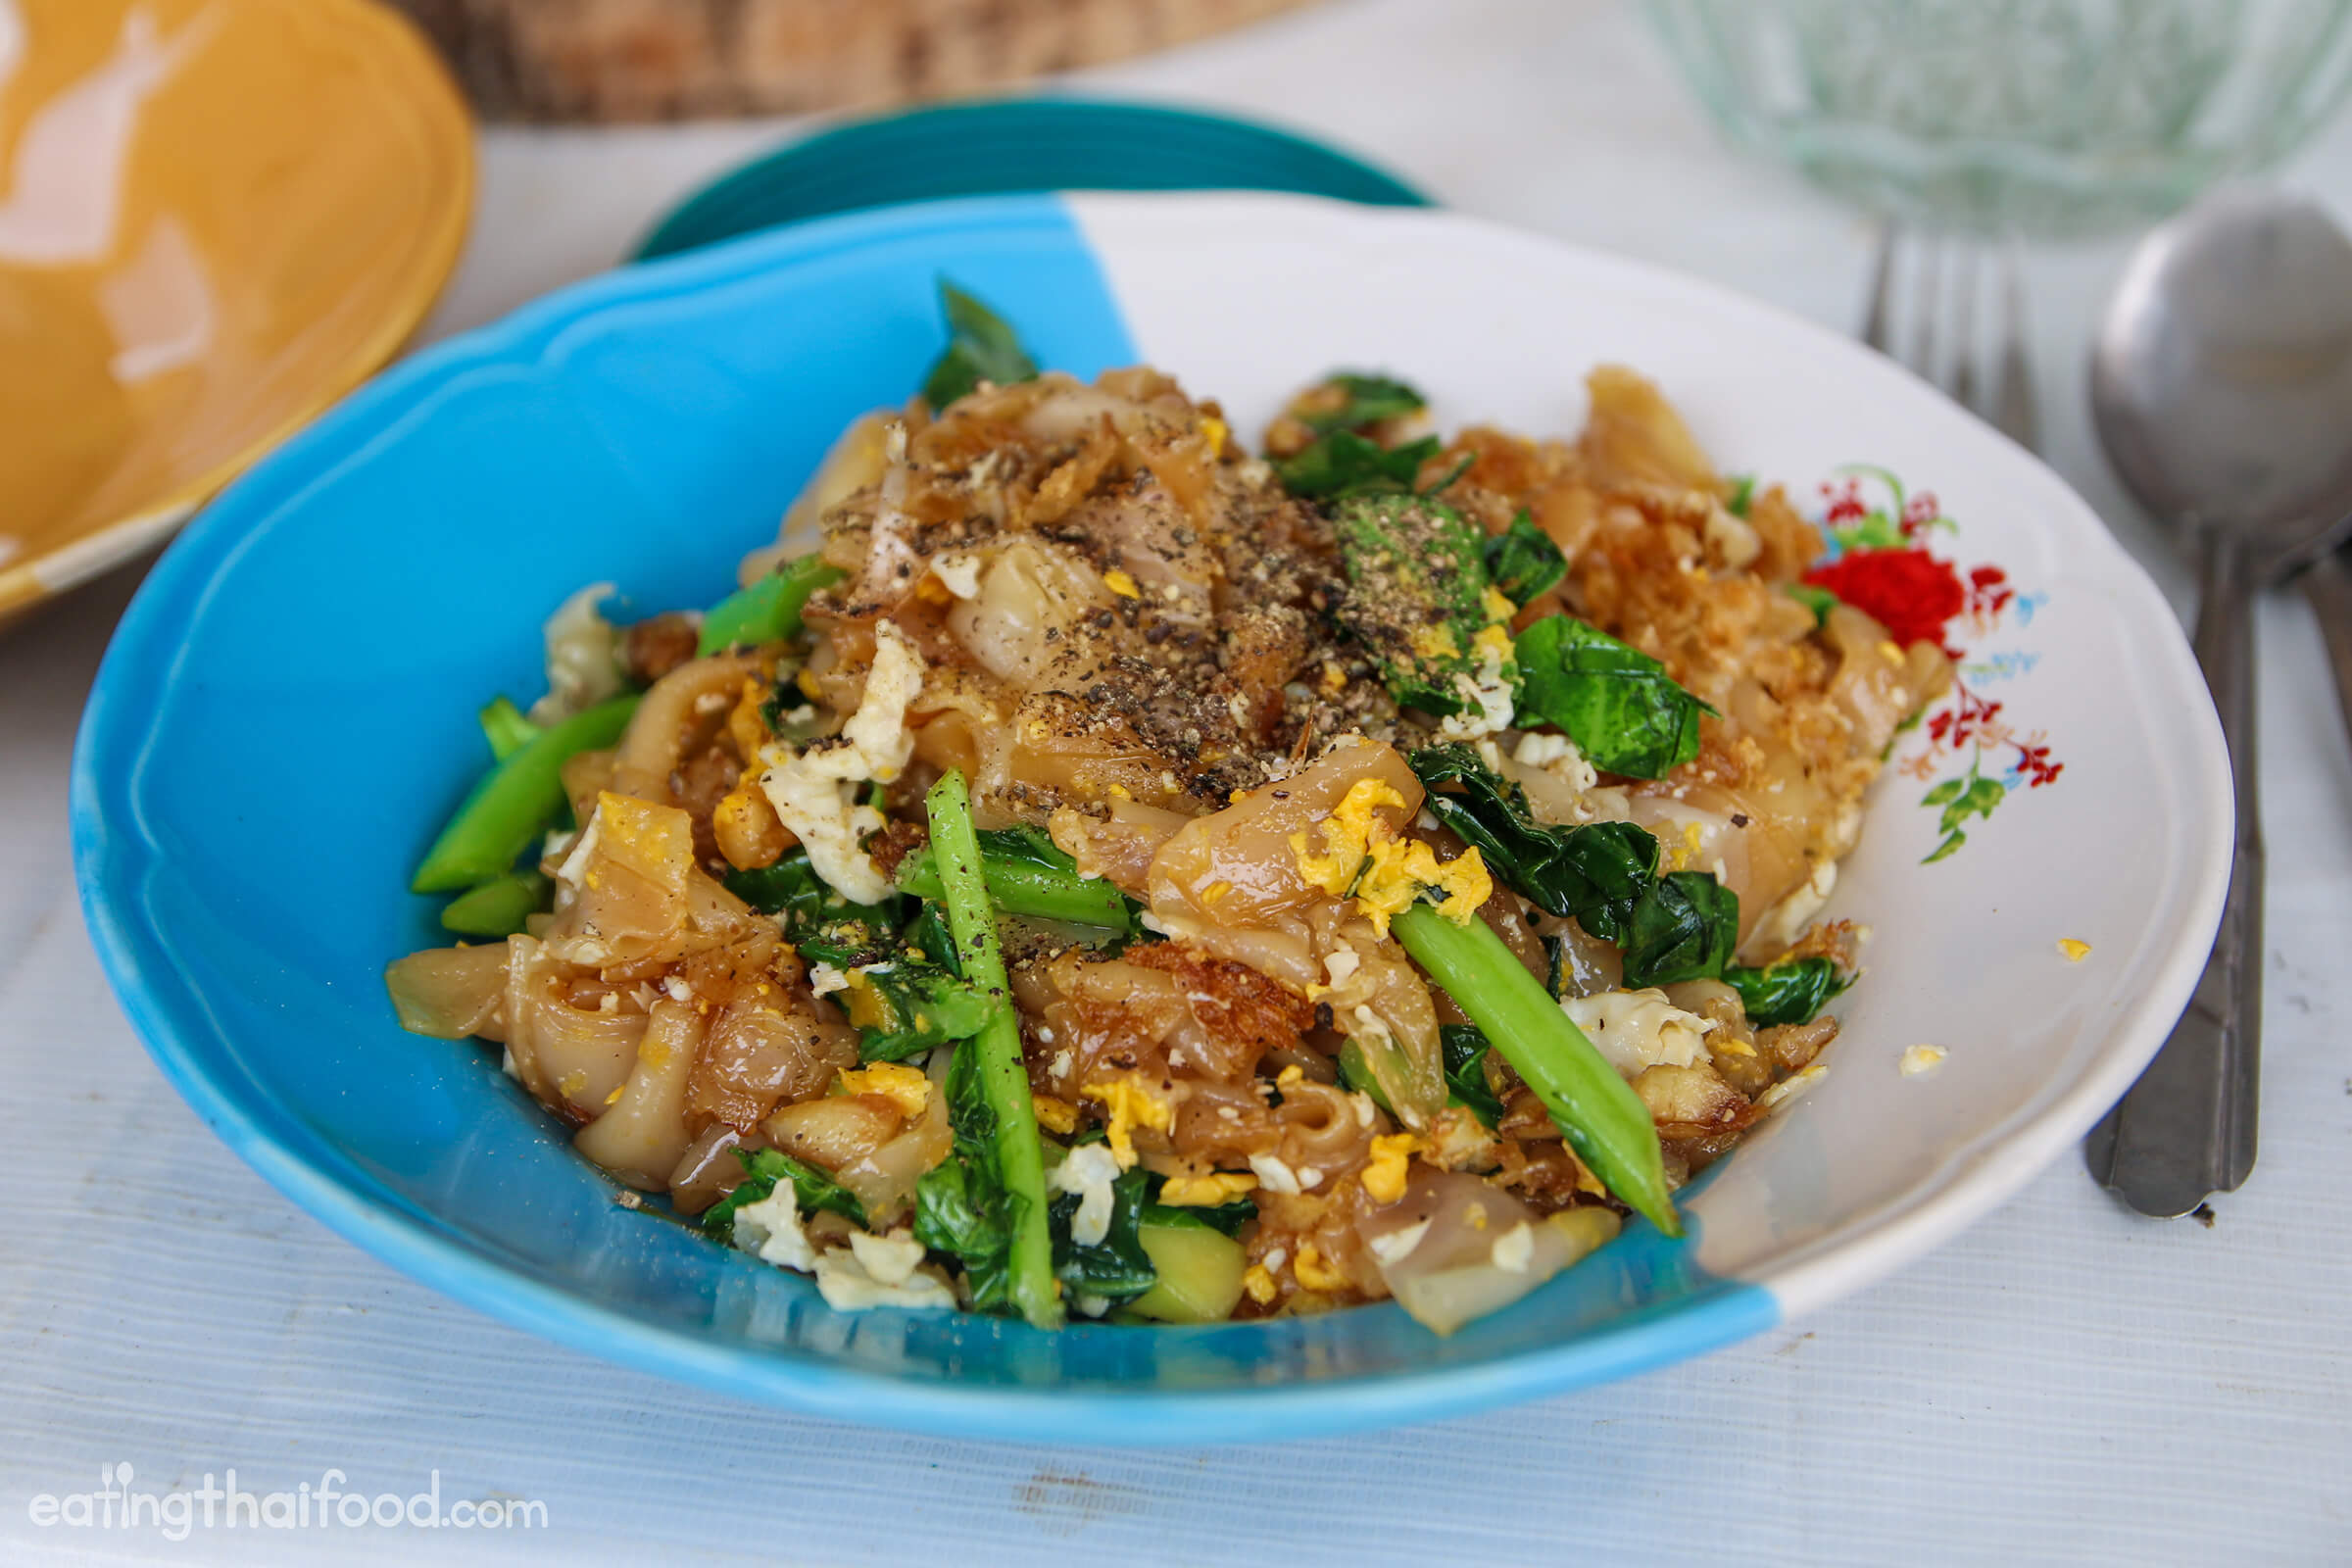 Authentic thai pad see ew recipe street food style ccuart Choice Image